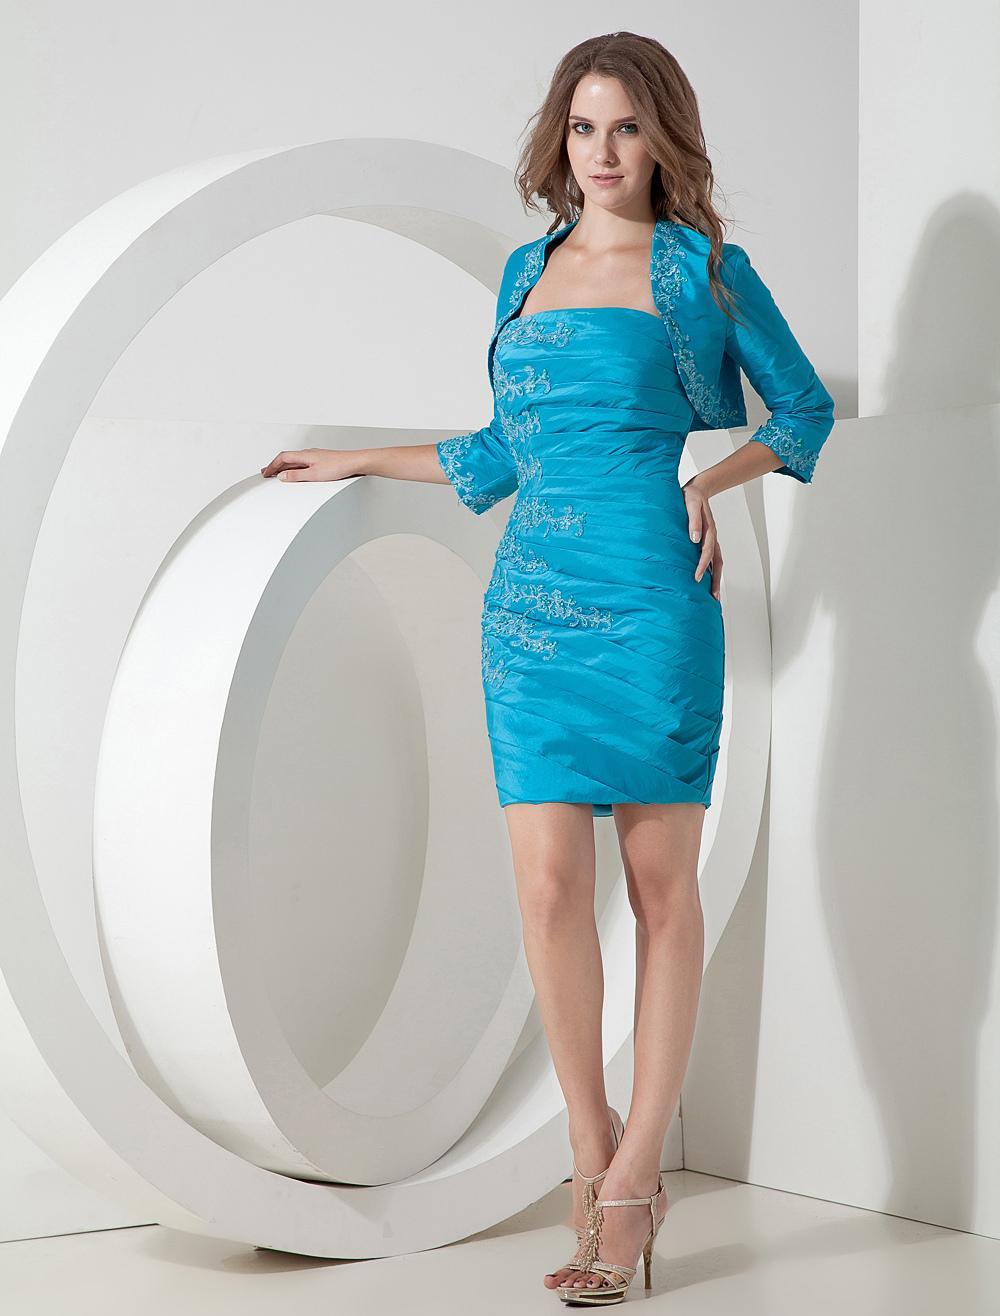 Bodycon Cocktail Dress 2 Piece Set Teal Taffeta Applique Pleated Mini Occasion Dress